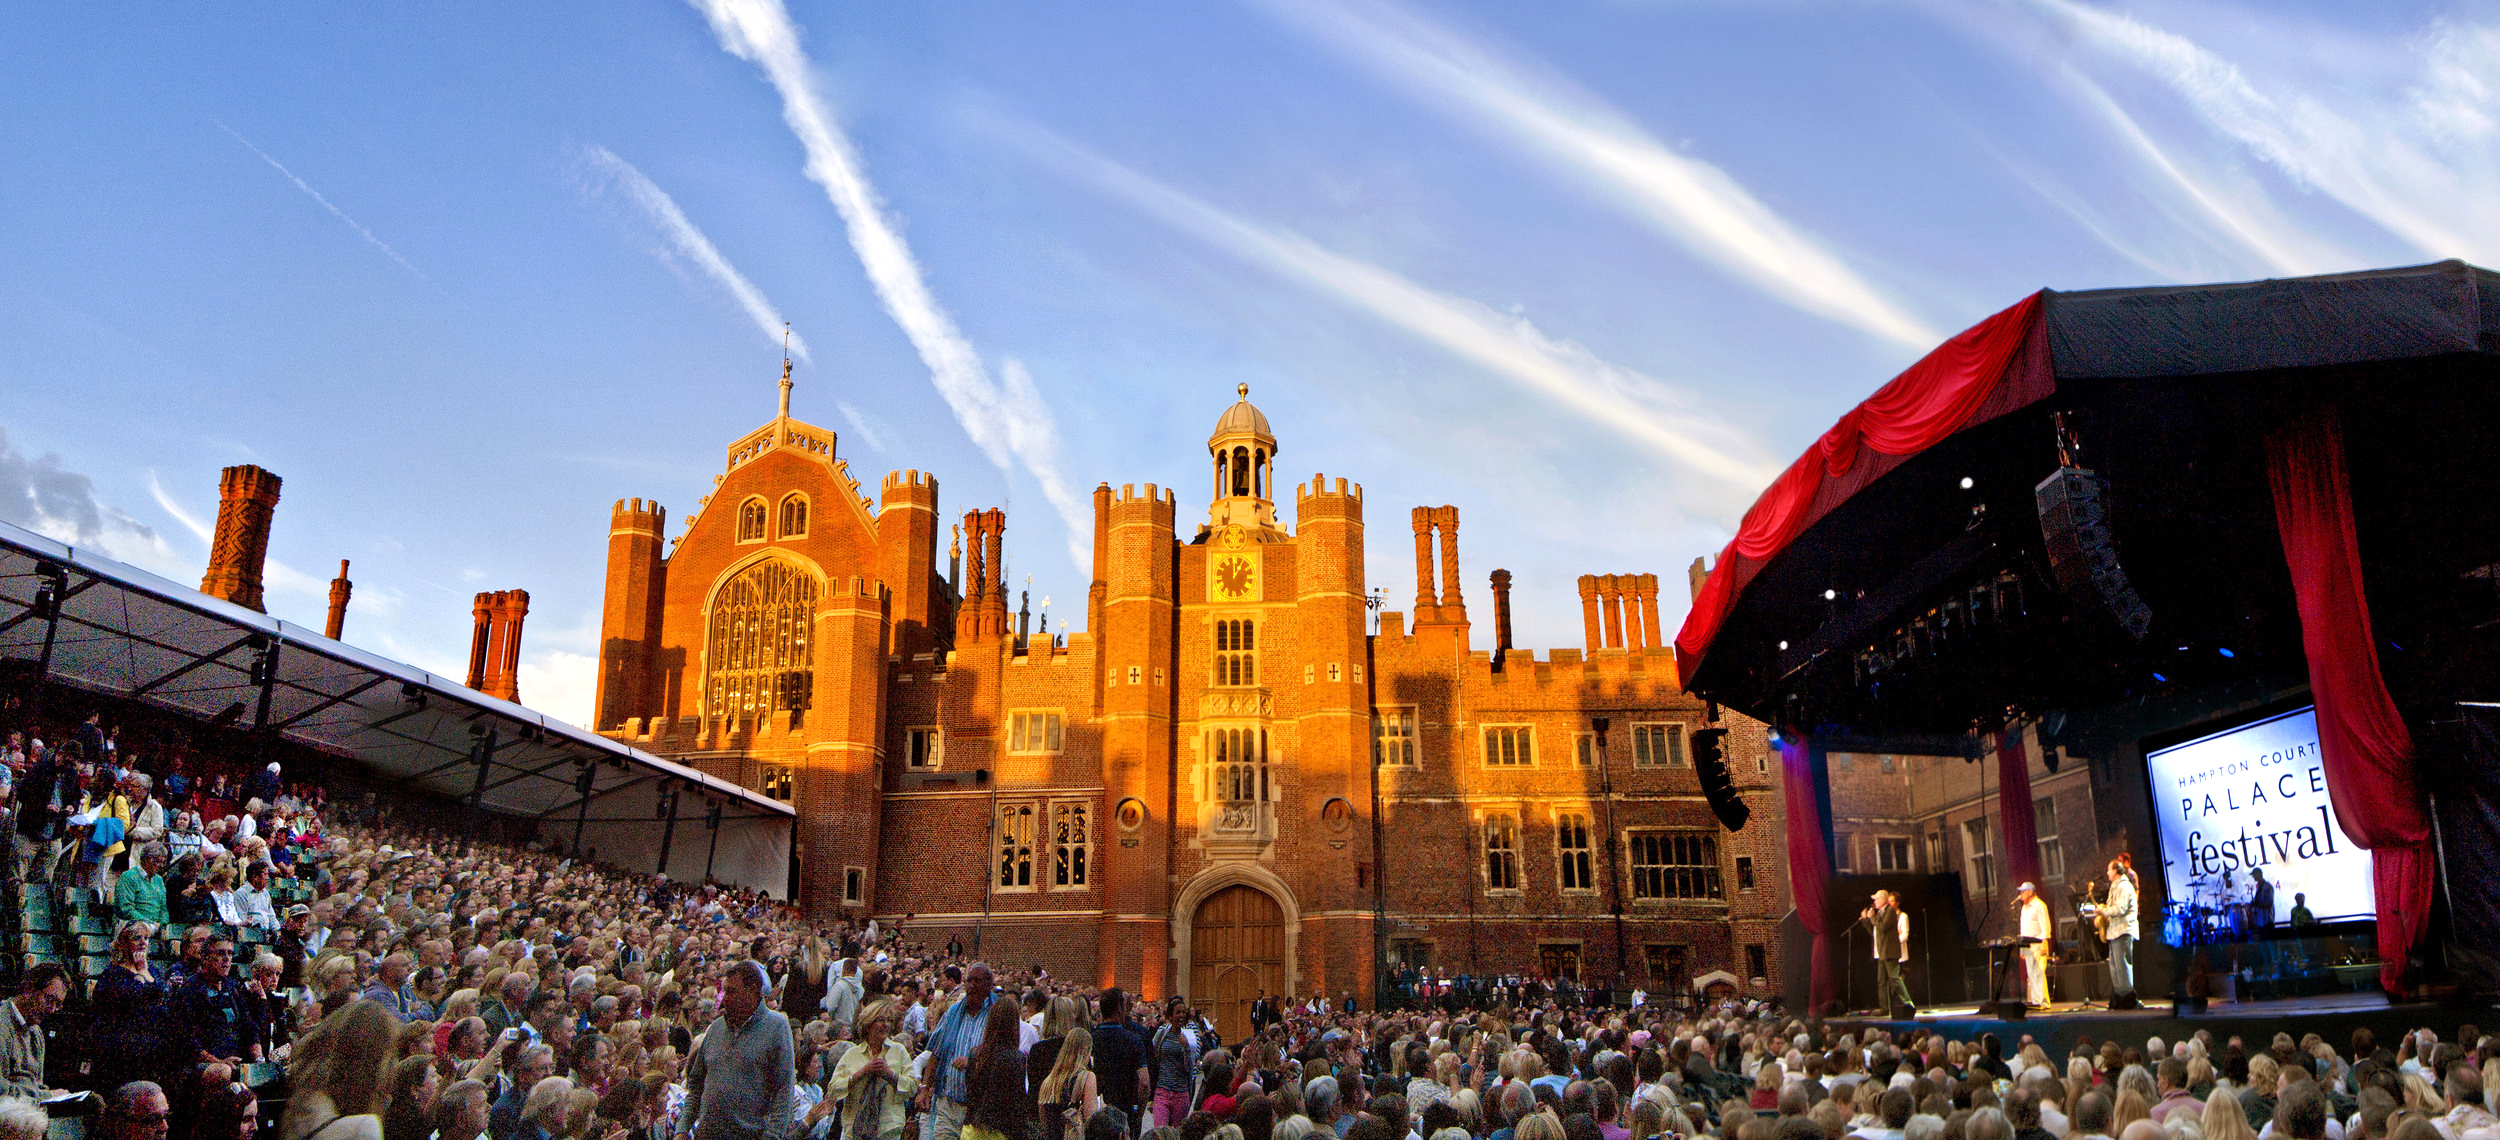 Hampton Court PalaceFestival presents themost stunning backdrop. 漢普頓宮音樂節出色的背景。© Hampton Court Palace